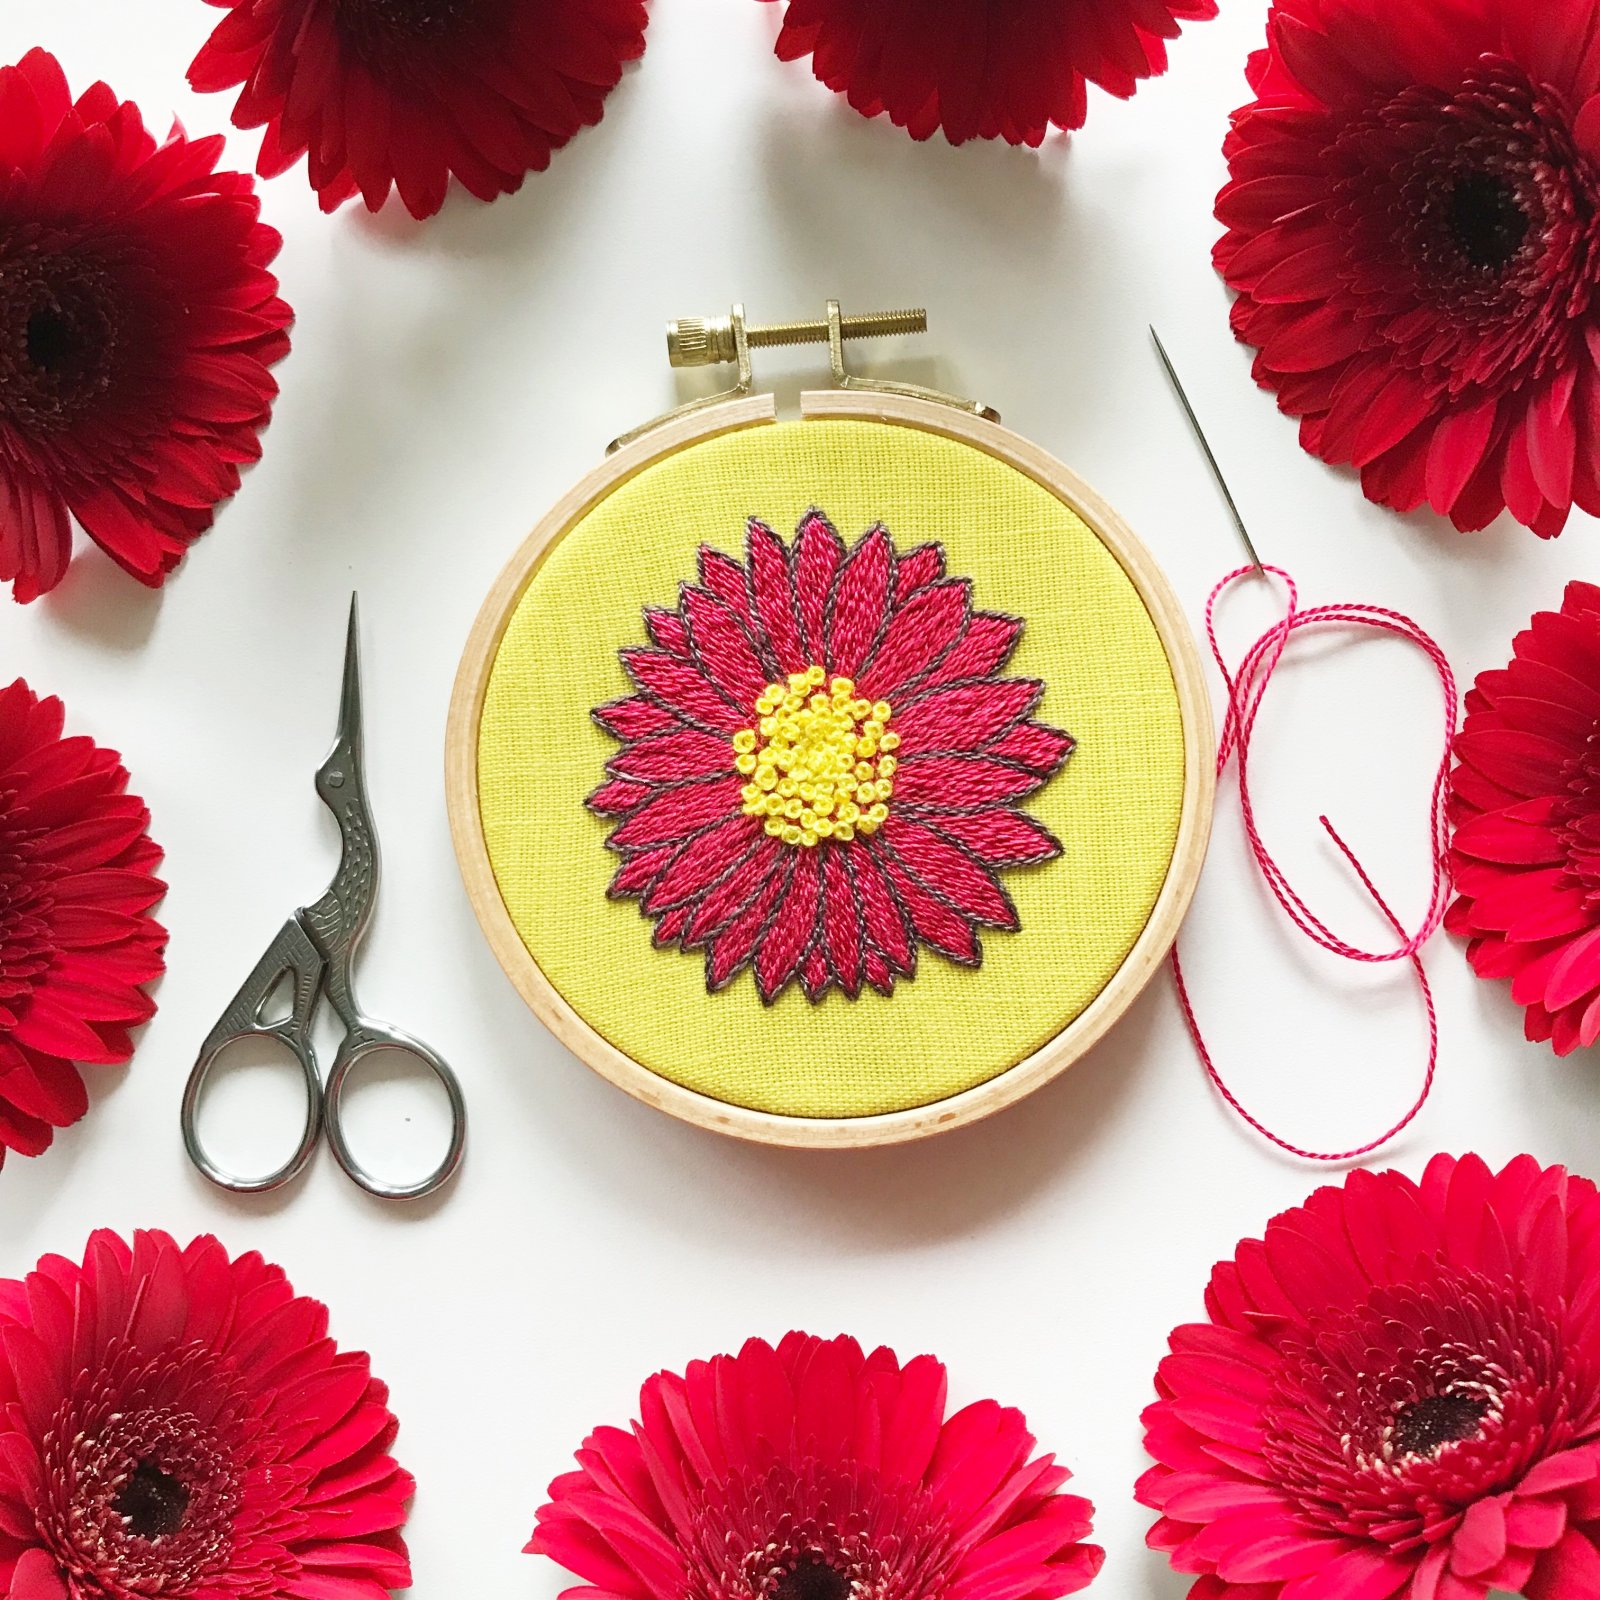 DIY Gorgeous Gerbera Embroidery Kit